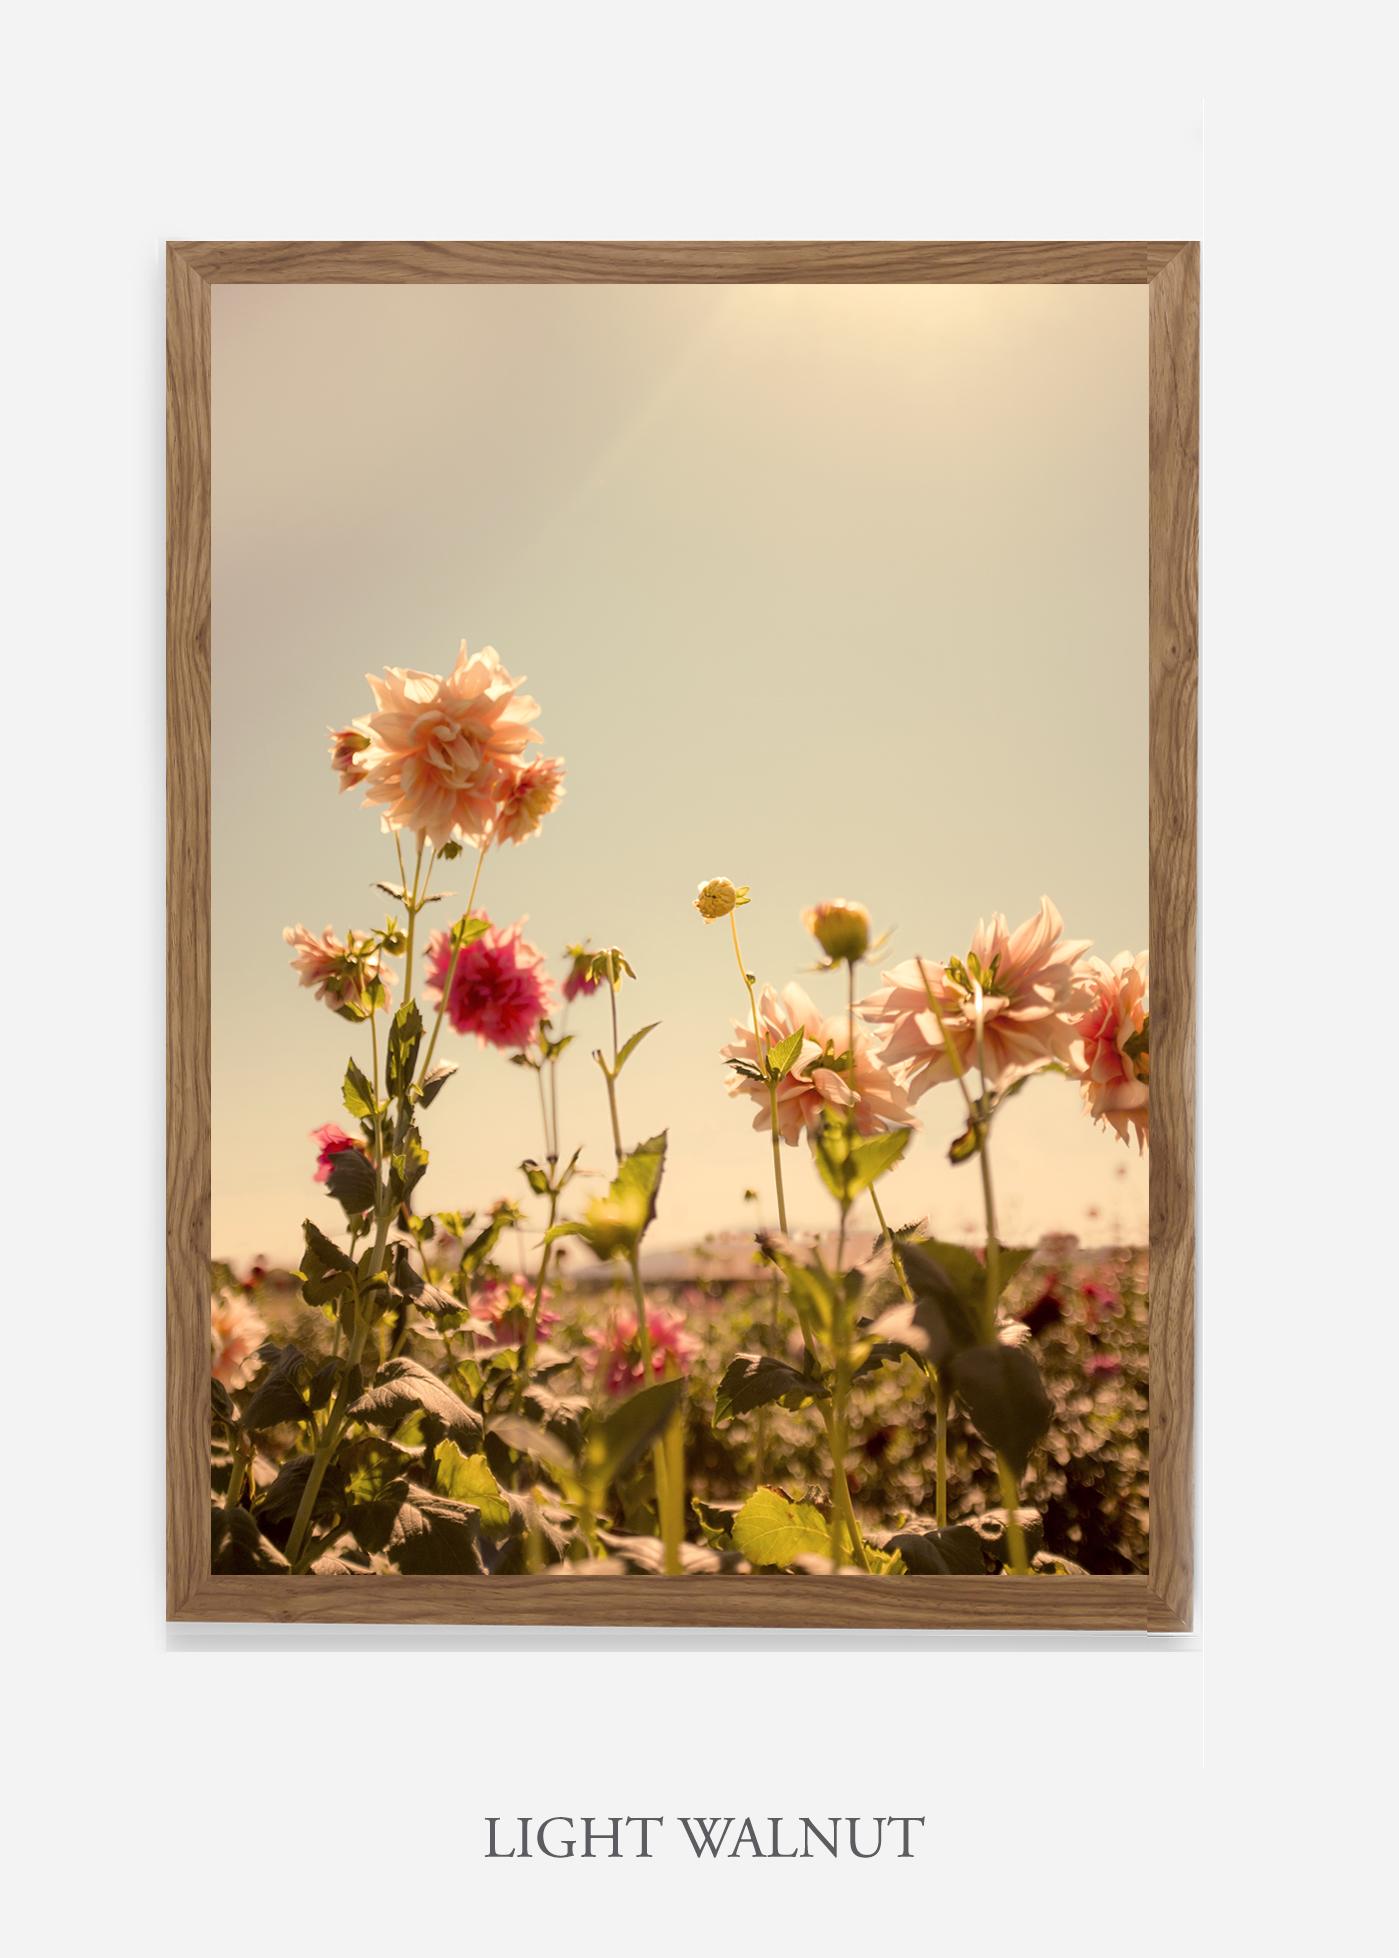 DahliaNo.3_lightwalnutframe__No.1_interiordesign_botanicalprint_art.jpg